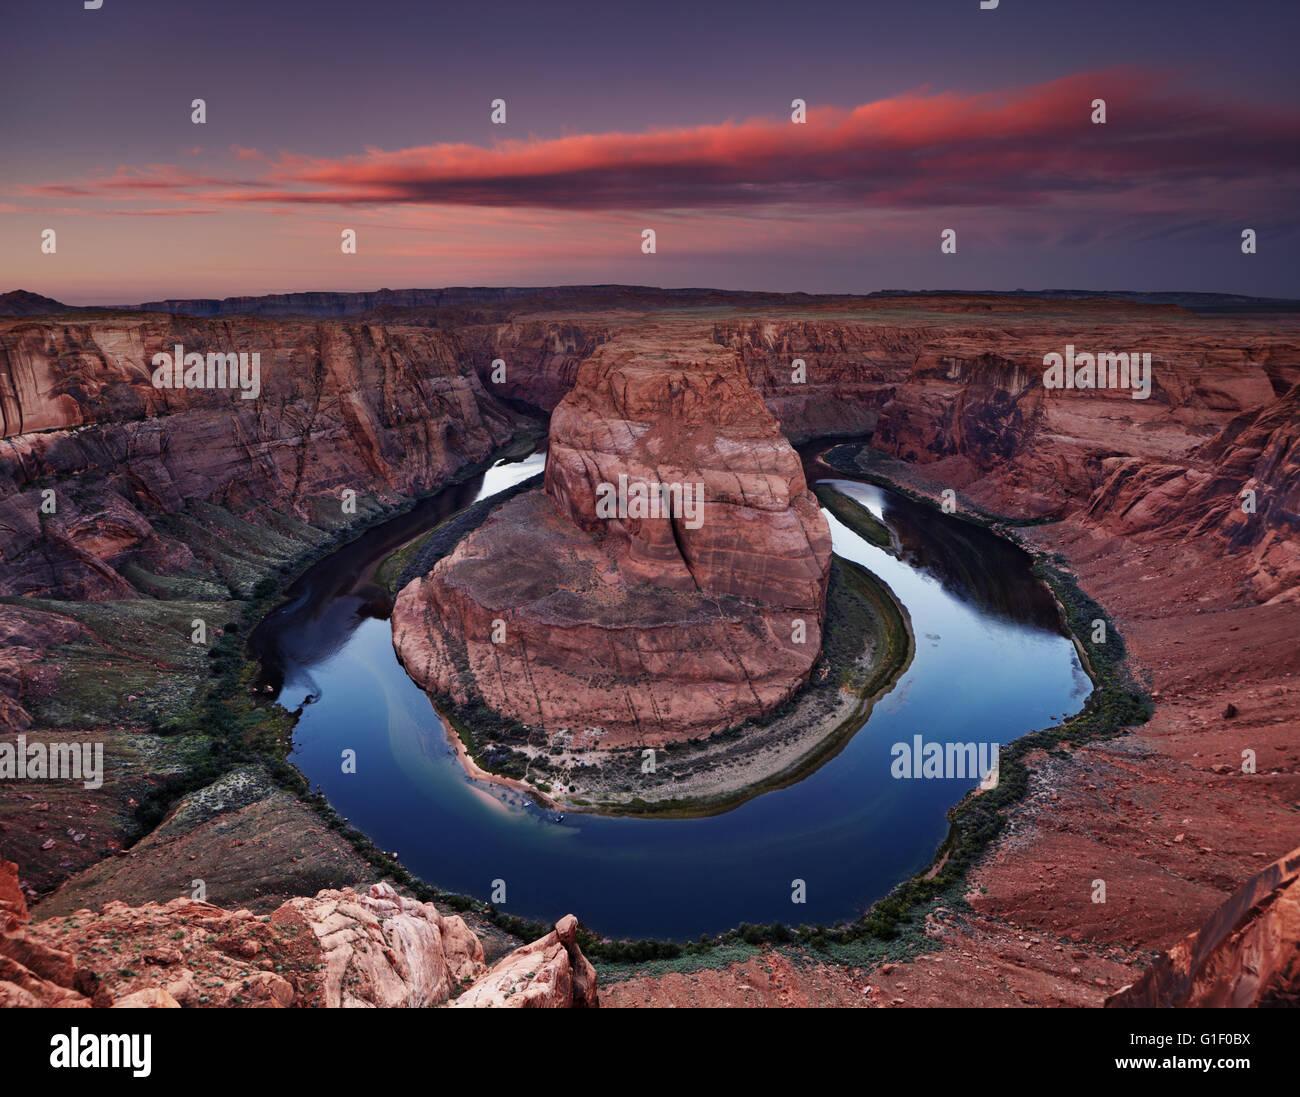 Colorado River at sunrise, Horse Shoe Bend, Page, Arizona, USA - Stock Image